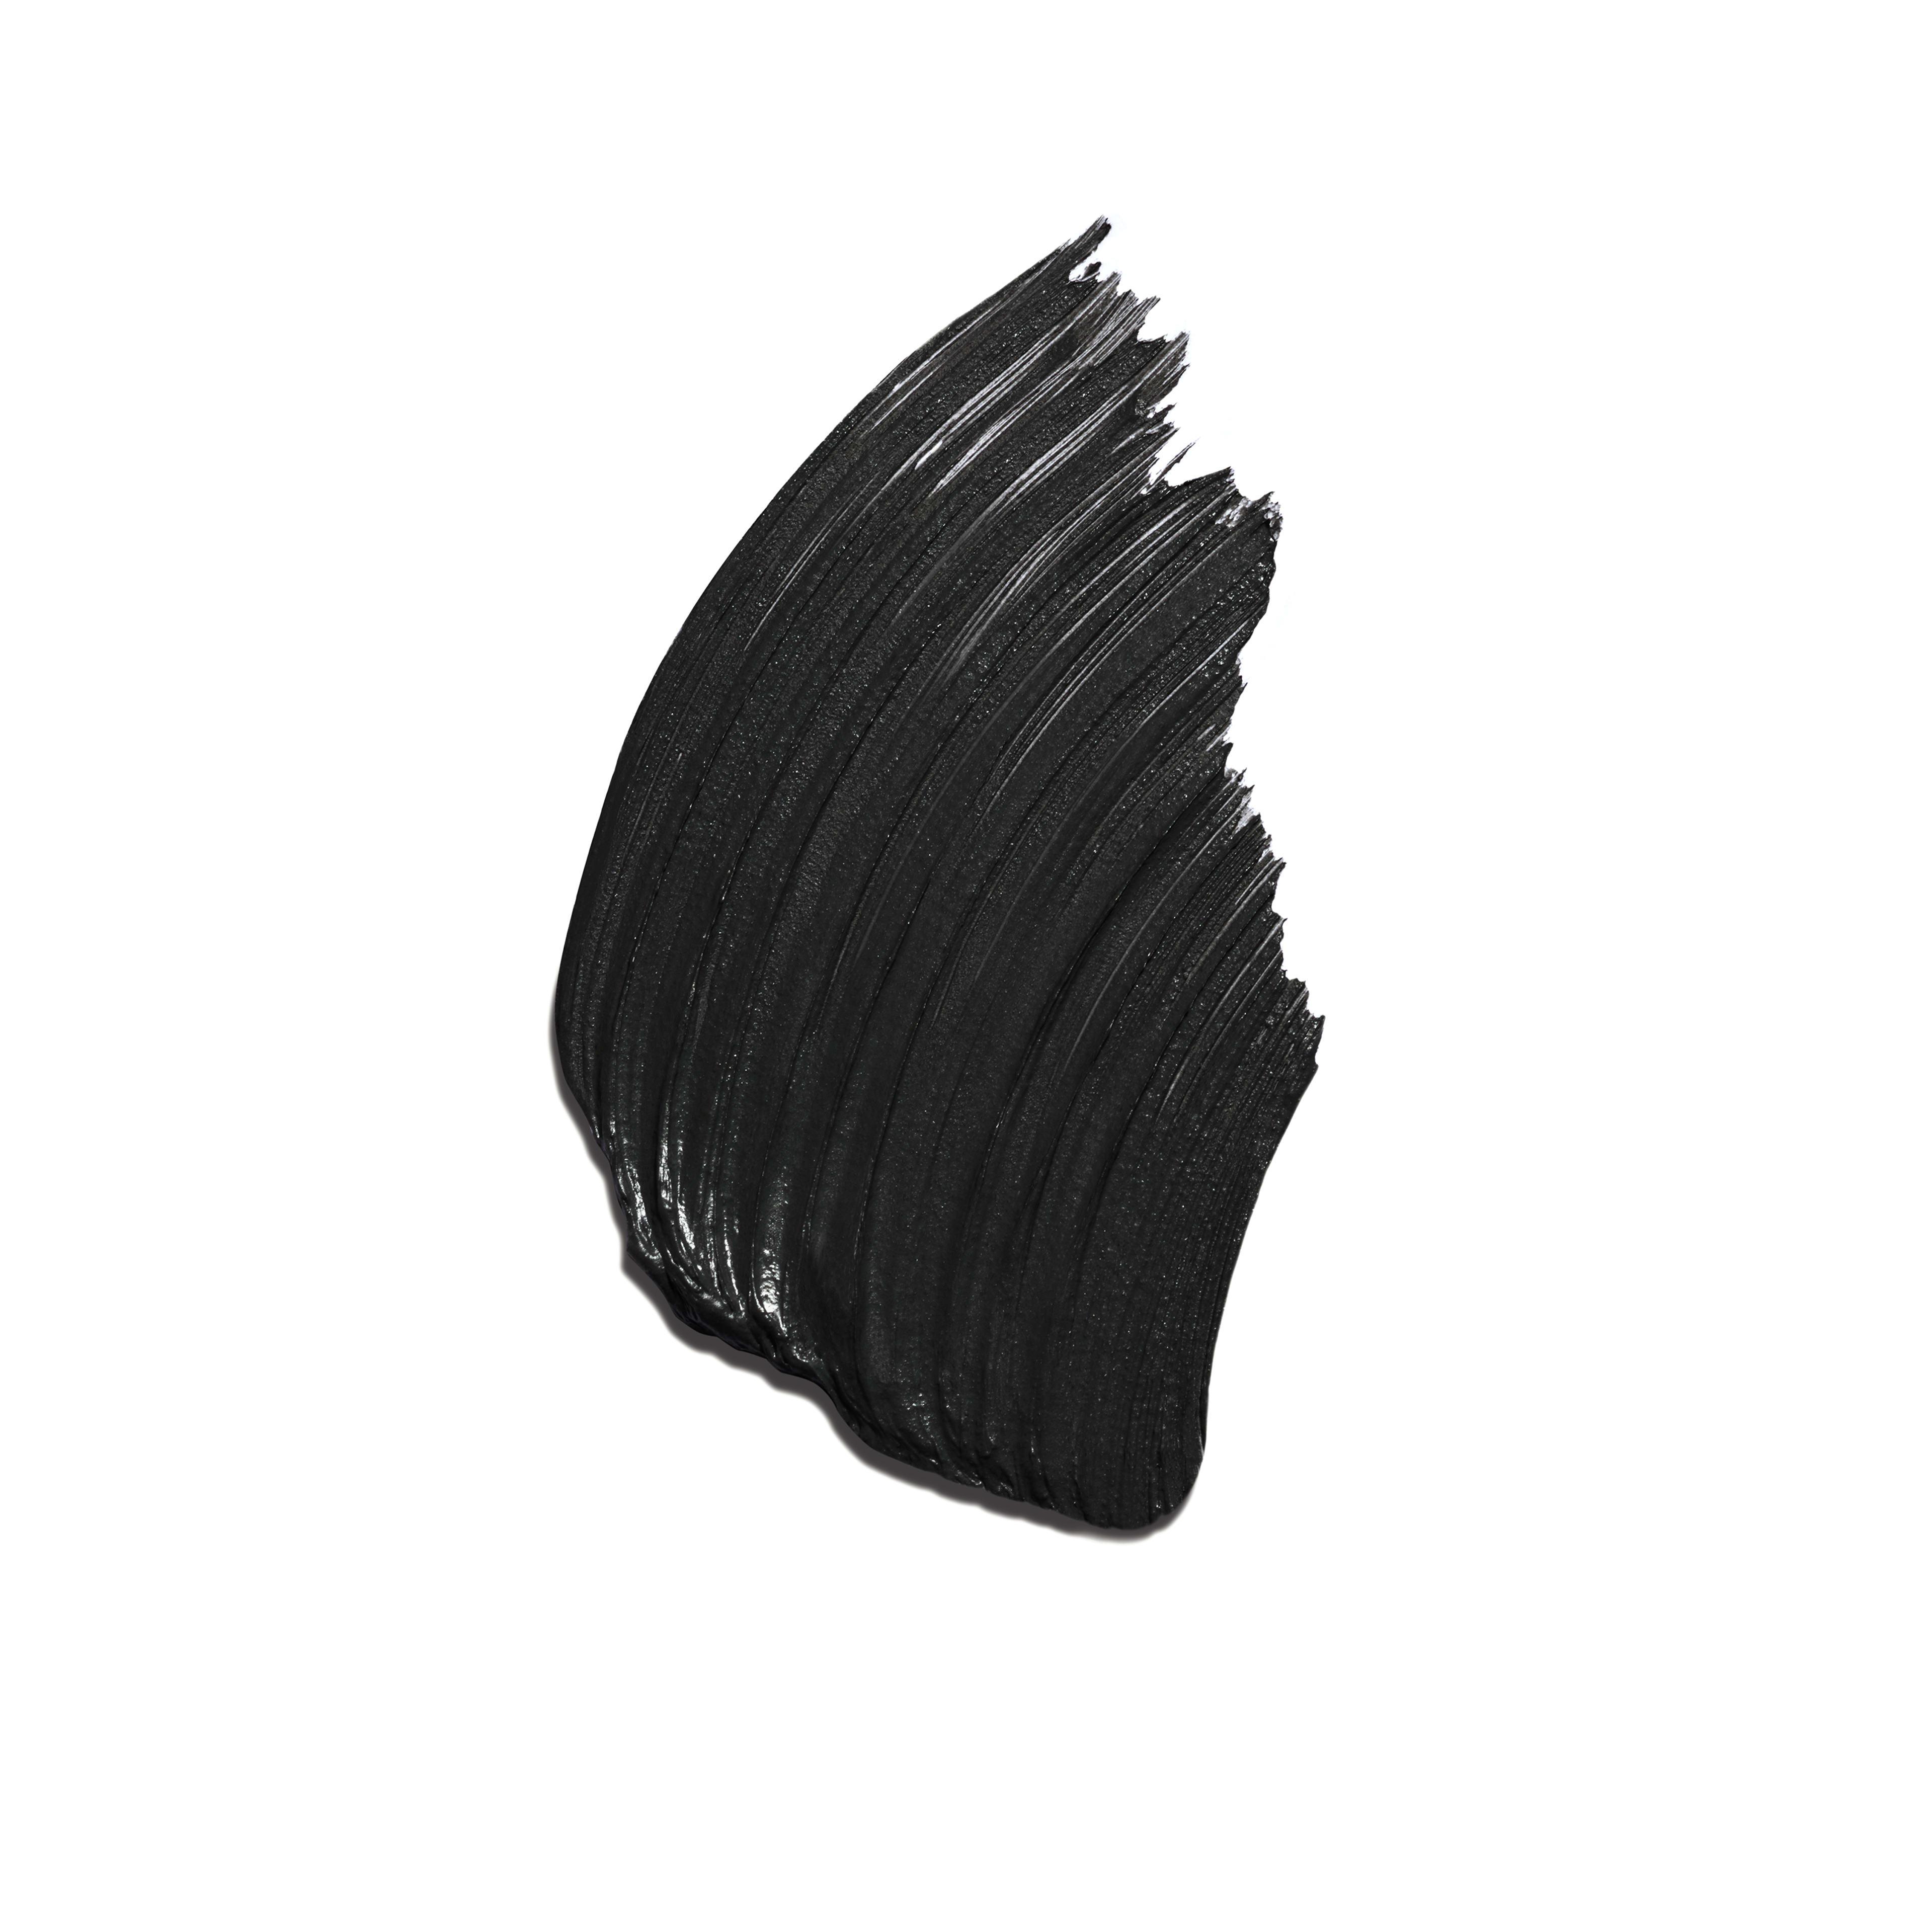 LE VOLUME DE CHANEL WATERPROOF - makeup - 0.21OZ. -                                                                 alternative view - see full sized version